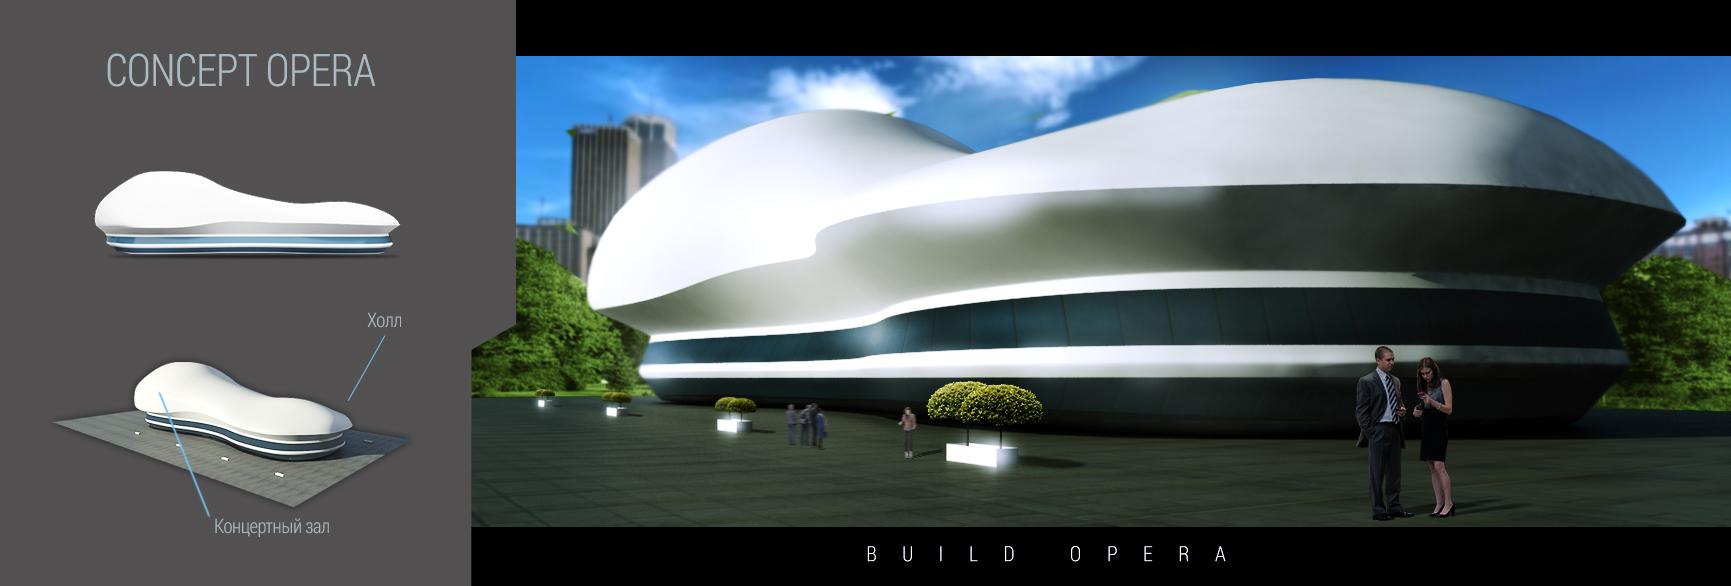 Разработка архитектурной концепции театра оперы и балета фото f_70952ee775018cba.jpg